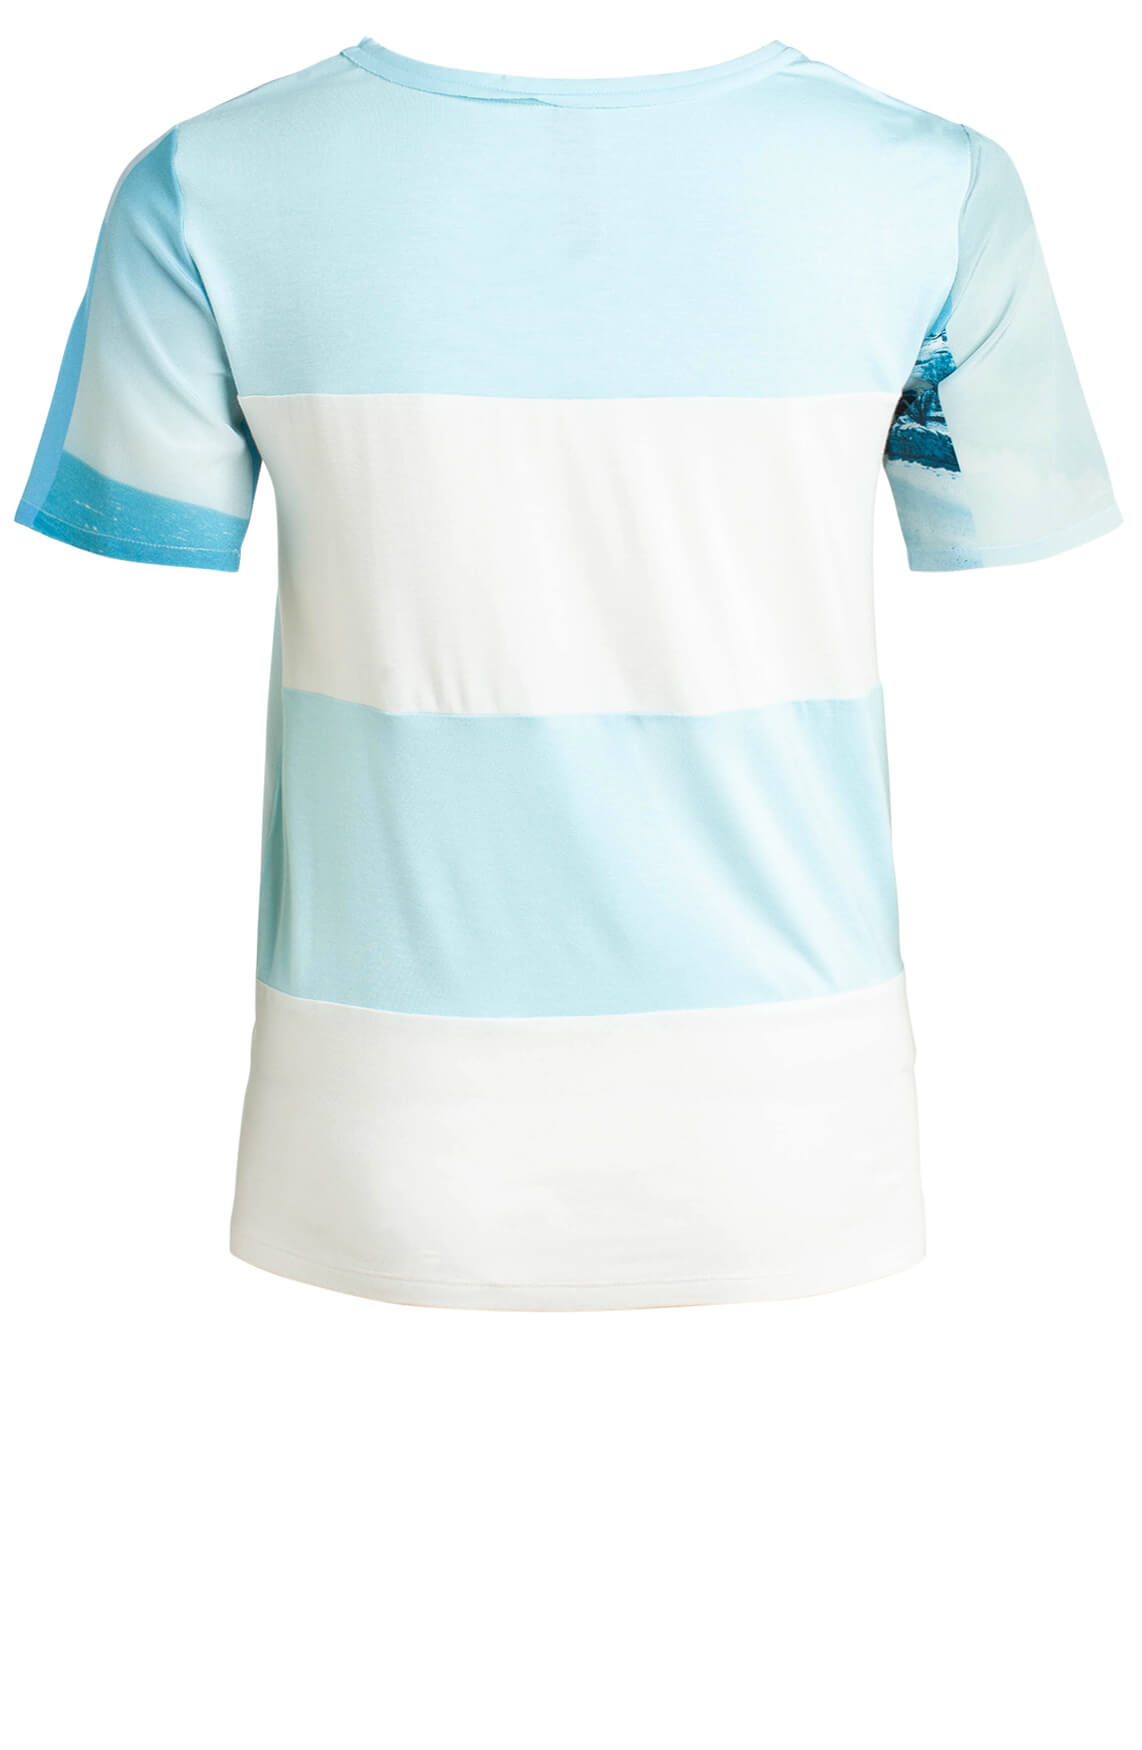 Marccain Dames Zijden blouseshirt Blauw